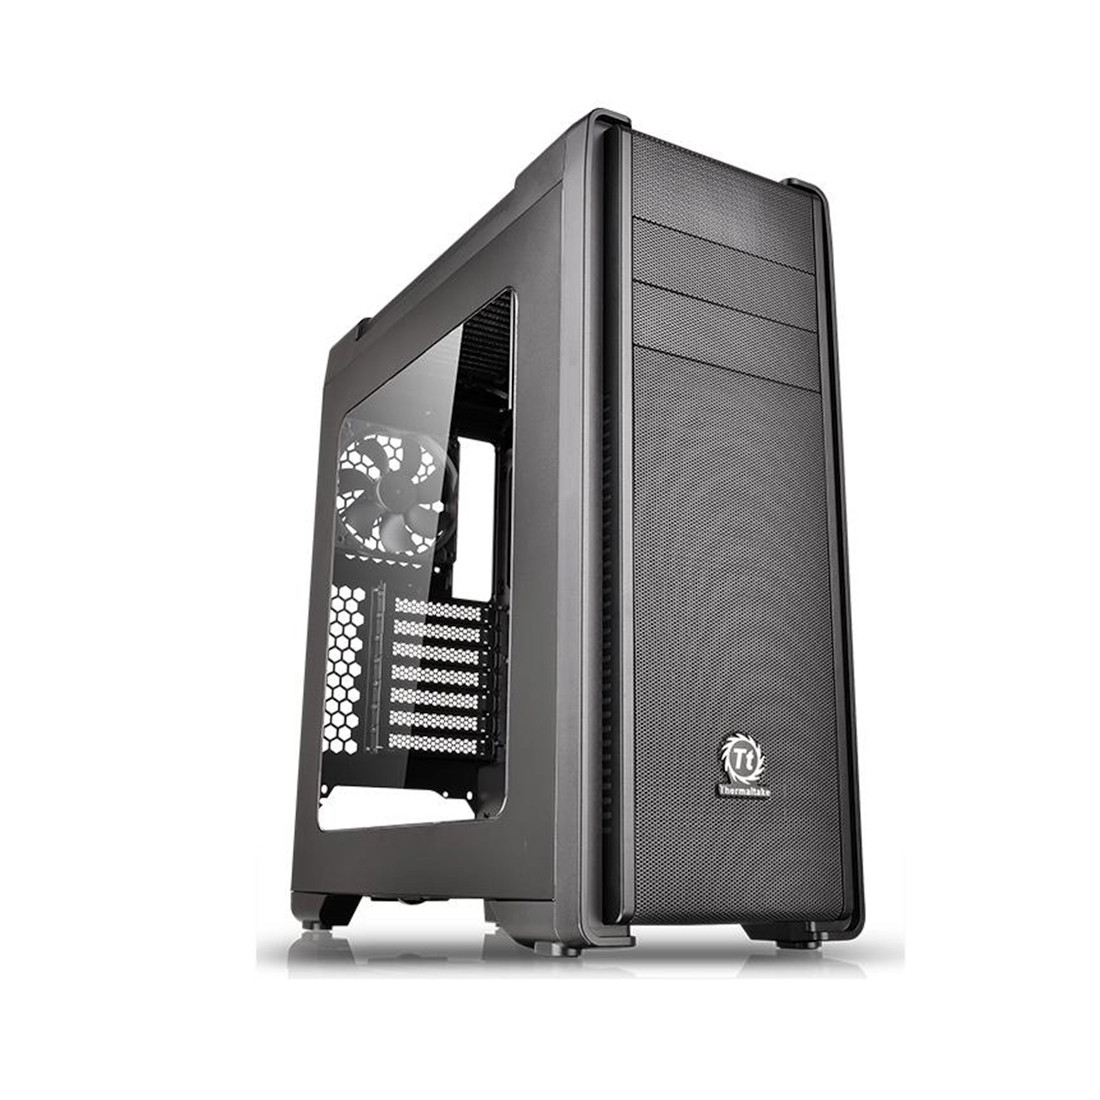 Компьютерный корпус Thermaltake Versa C21 RGB Black CA-1G8-00M1WN-00 (Без Б/П)